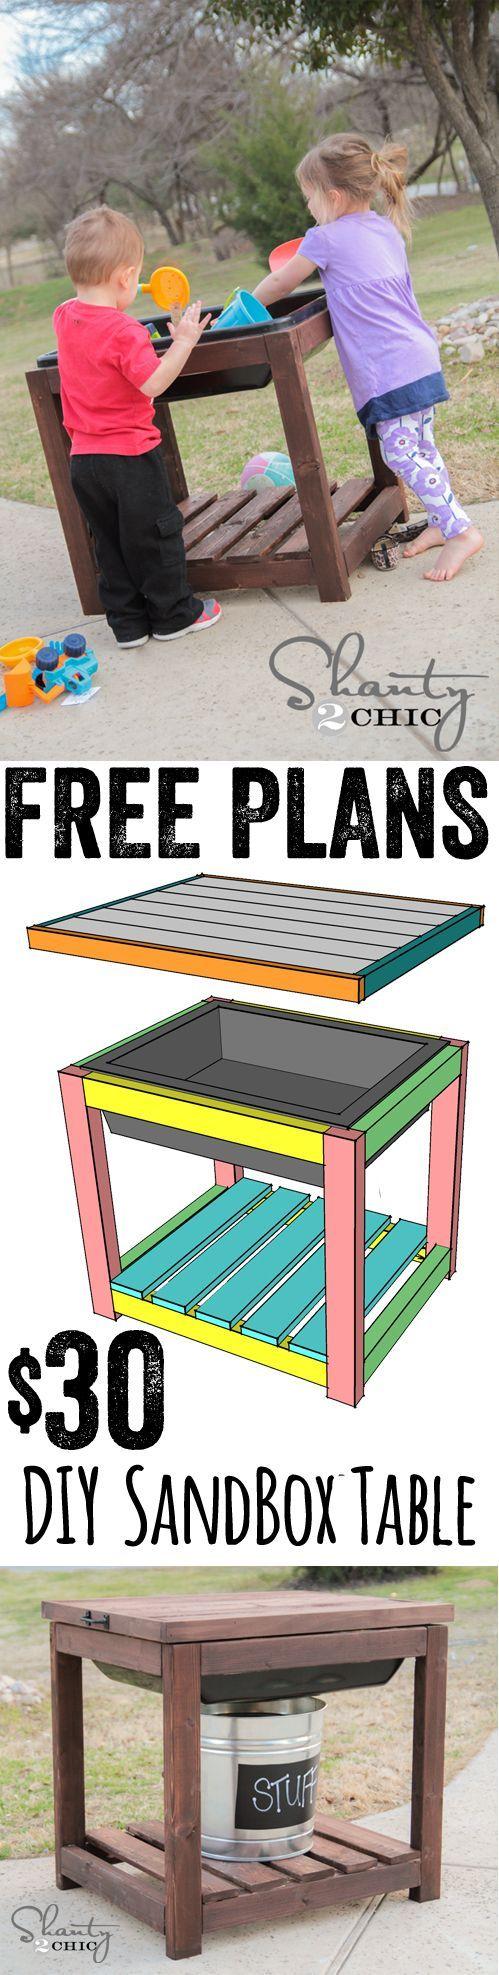 DIY Sandbox Table Sandbox, Tables and DIY and crafts